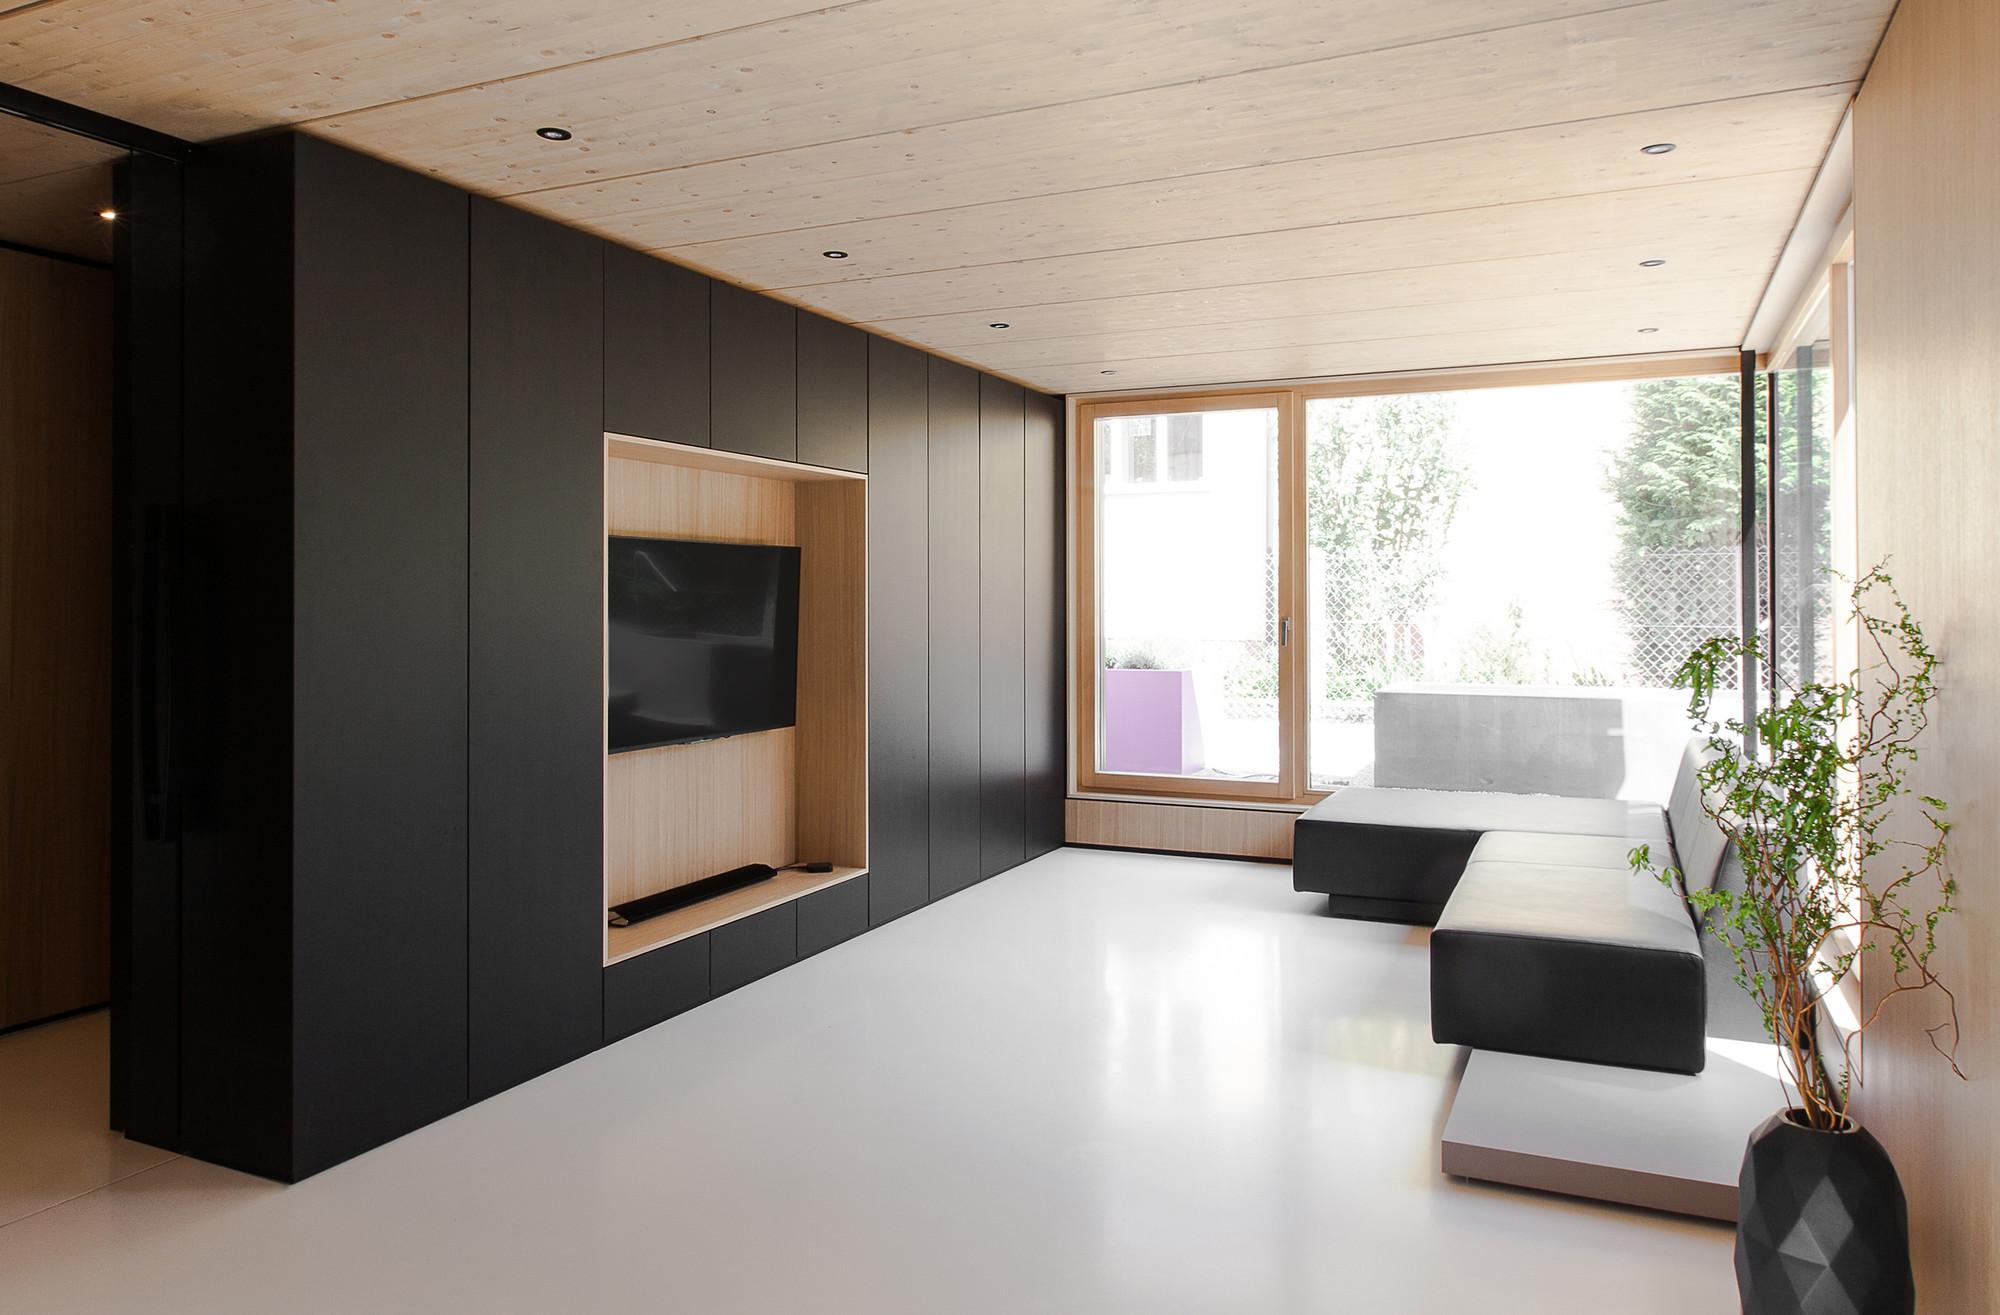 gallery of house b format elf architekten 11. Black Bedroom Furniture Sets. Home Design Ideas